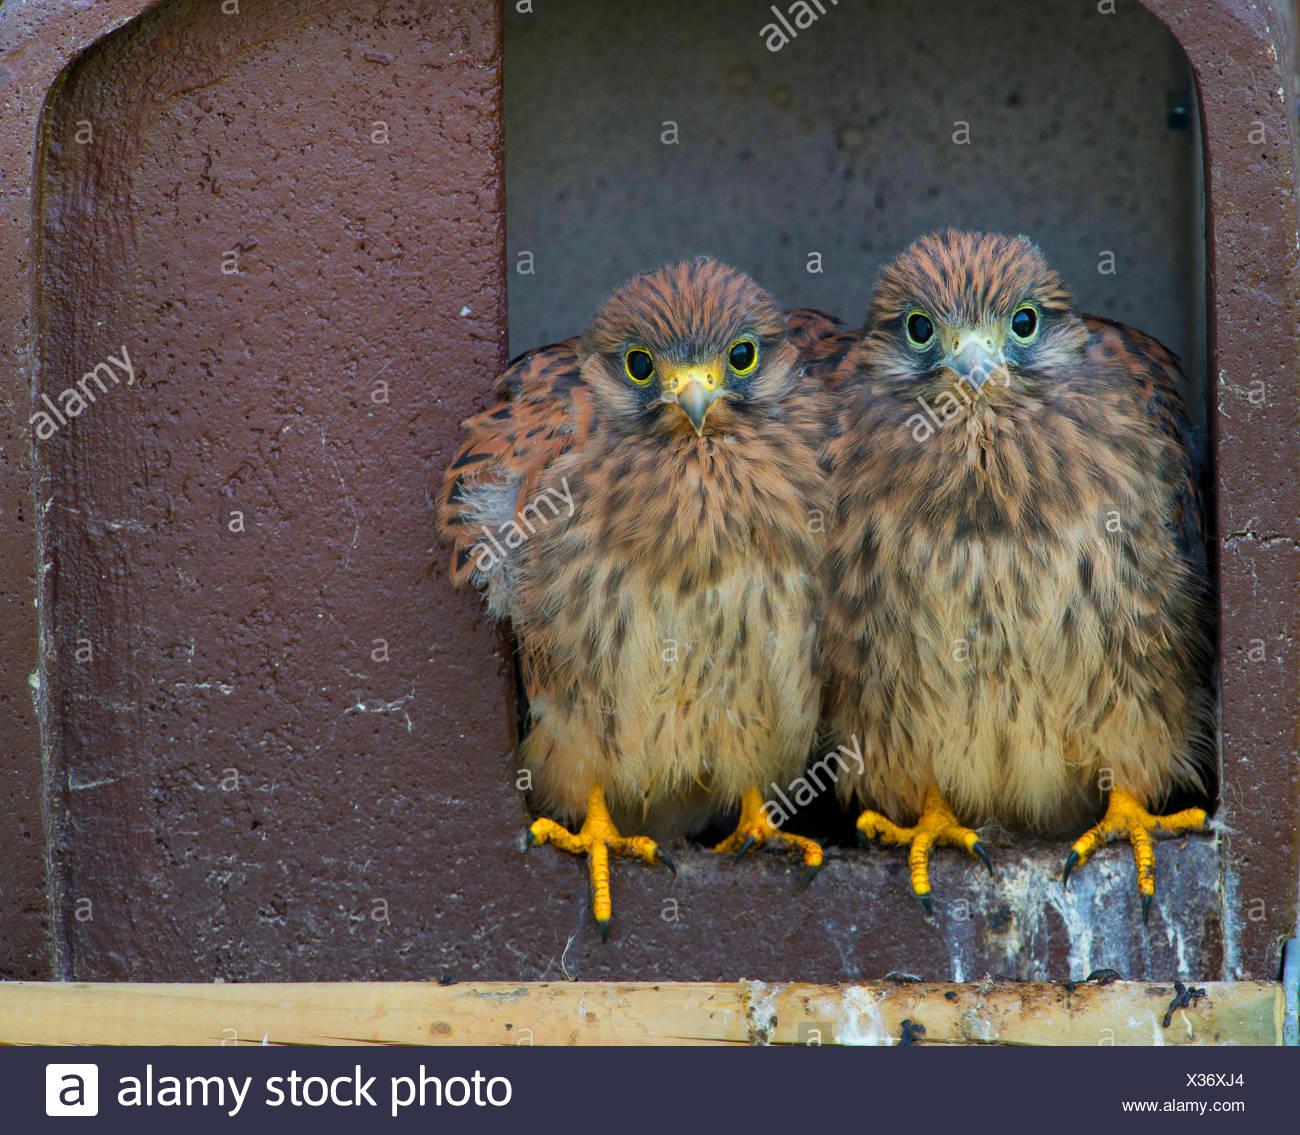 European Kestrel, Eurasian Kestrel, Old World Kestrel, Common Kestrel (Falco tinnunculus), two squabs sitting together in a nesting box, front view, Germany, Bavaria Stock Photo